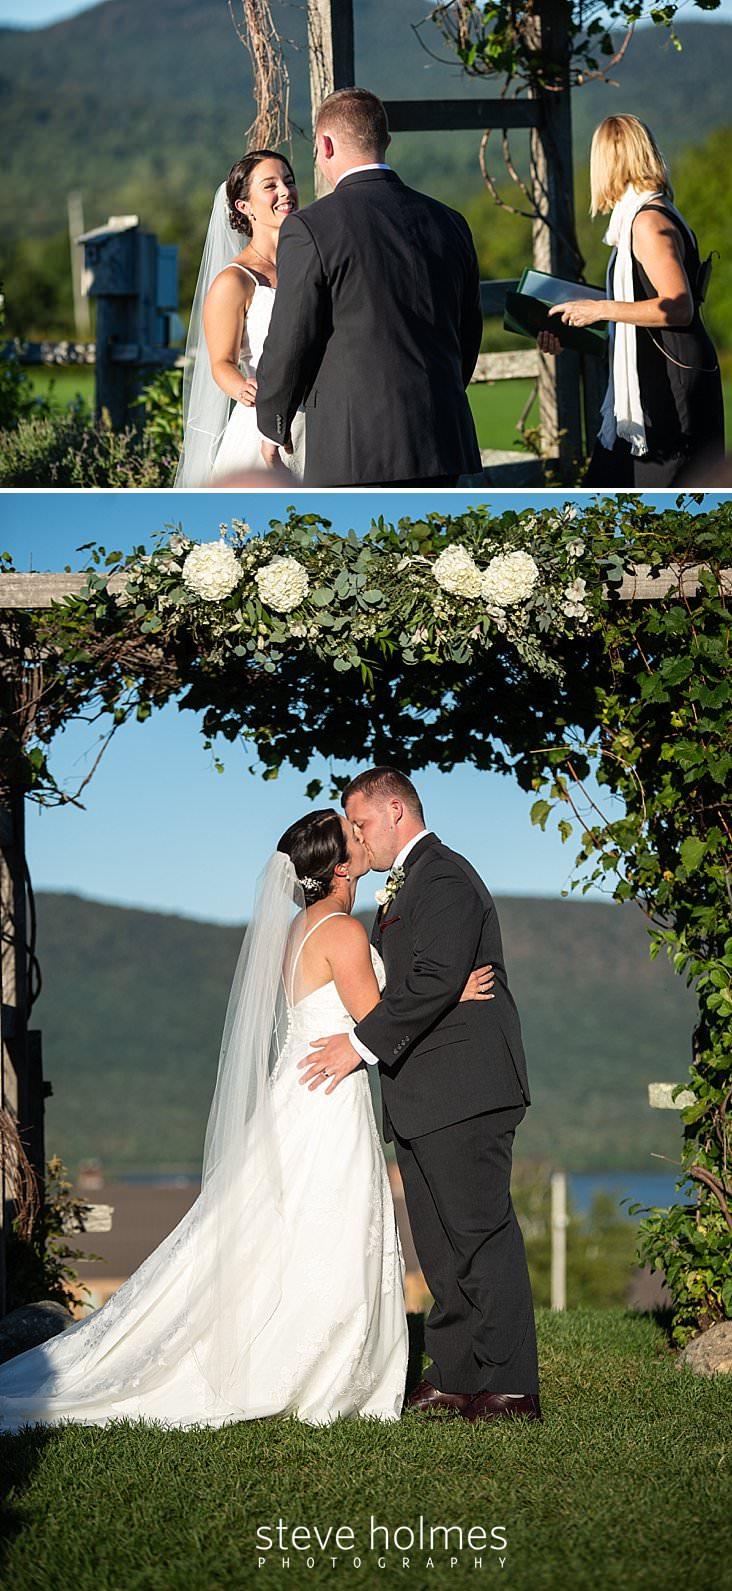 41_Bride smiles at groom during outdoor wedding ceremony.jpg